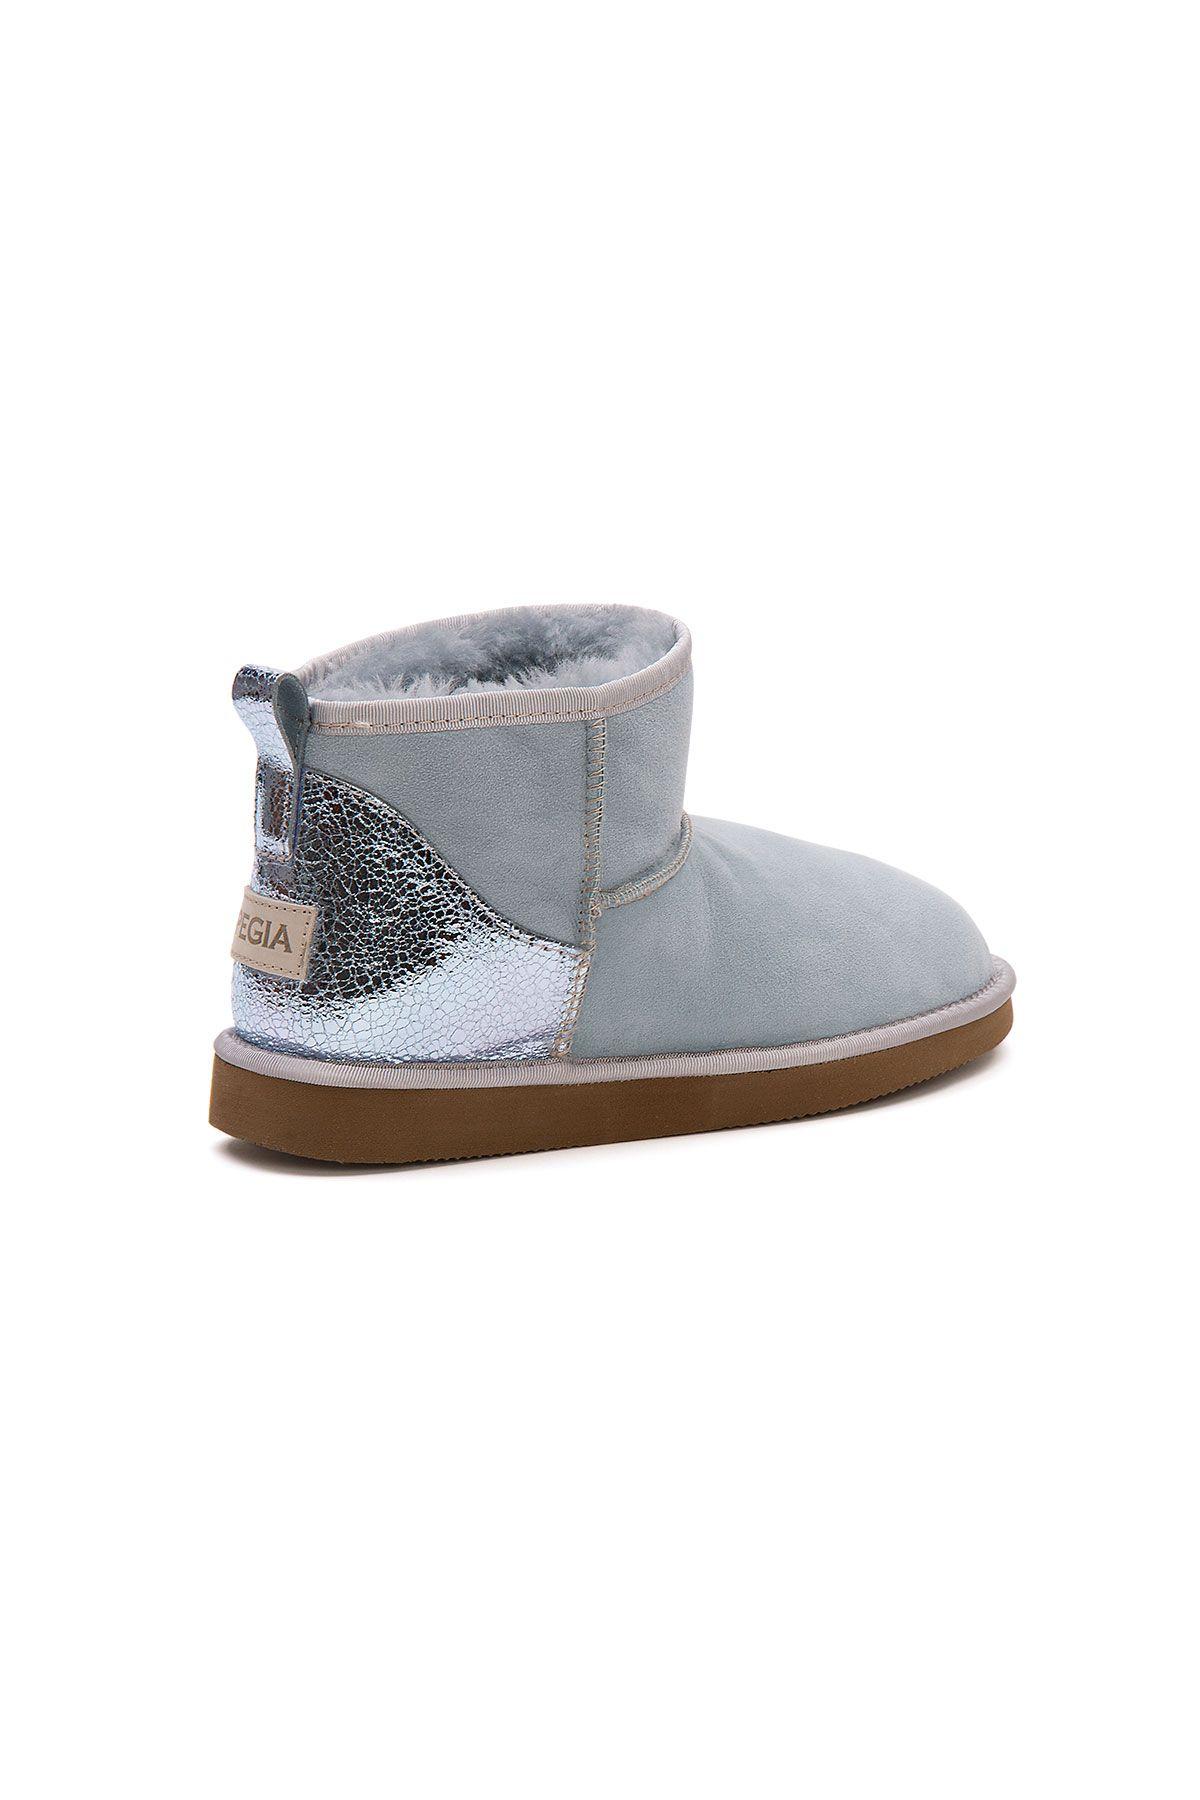 Pegia Shearling Women's Mini Boots 191133 Blue